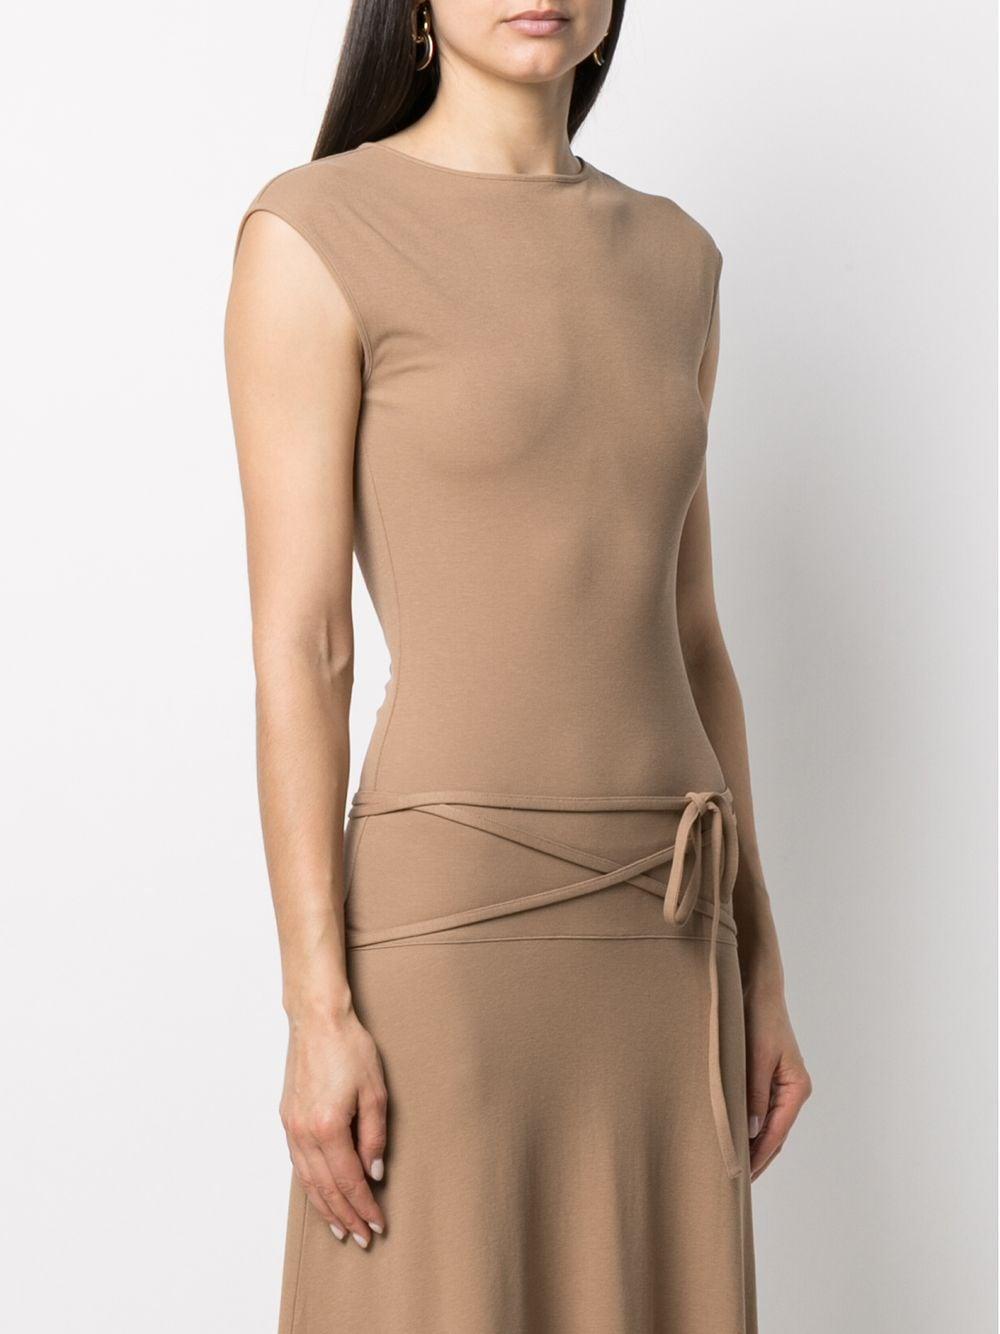 LEMAIRE | Dress | W211JE420LJ054453